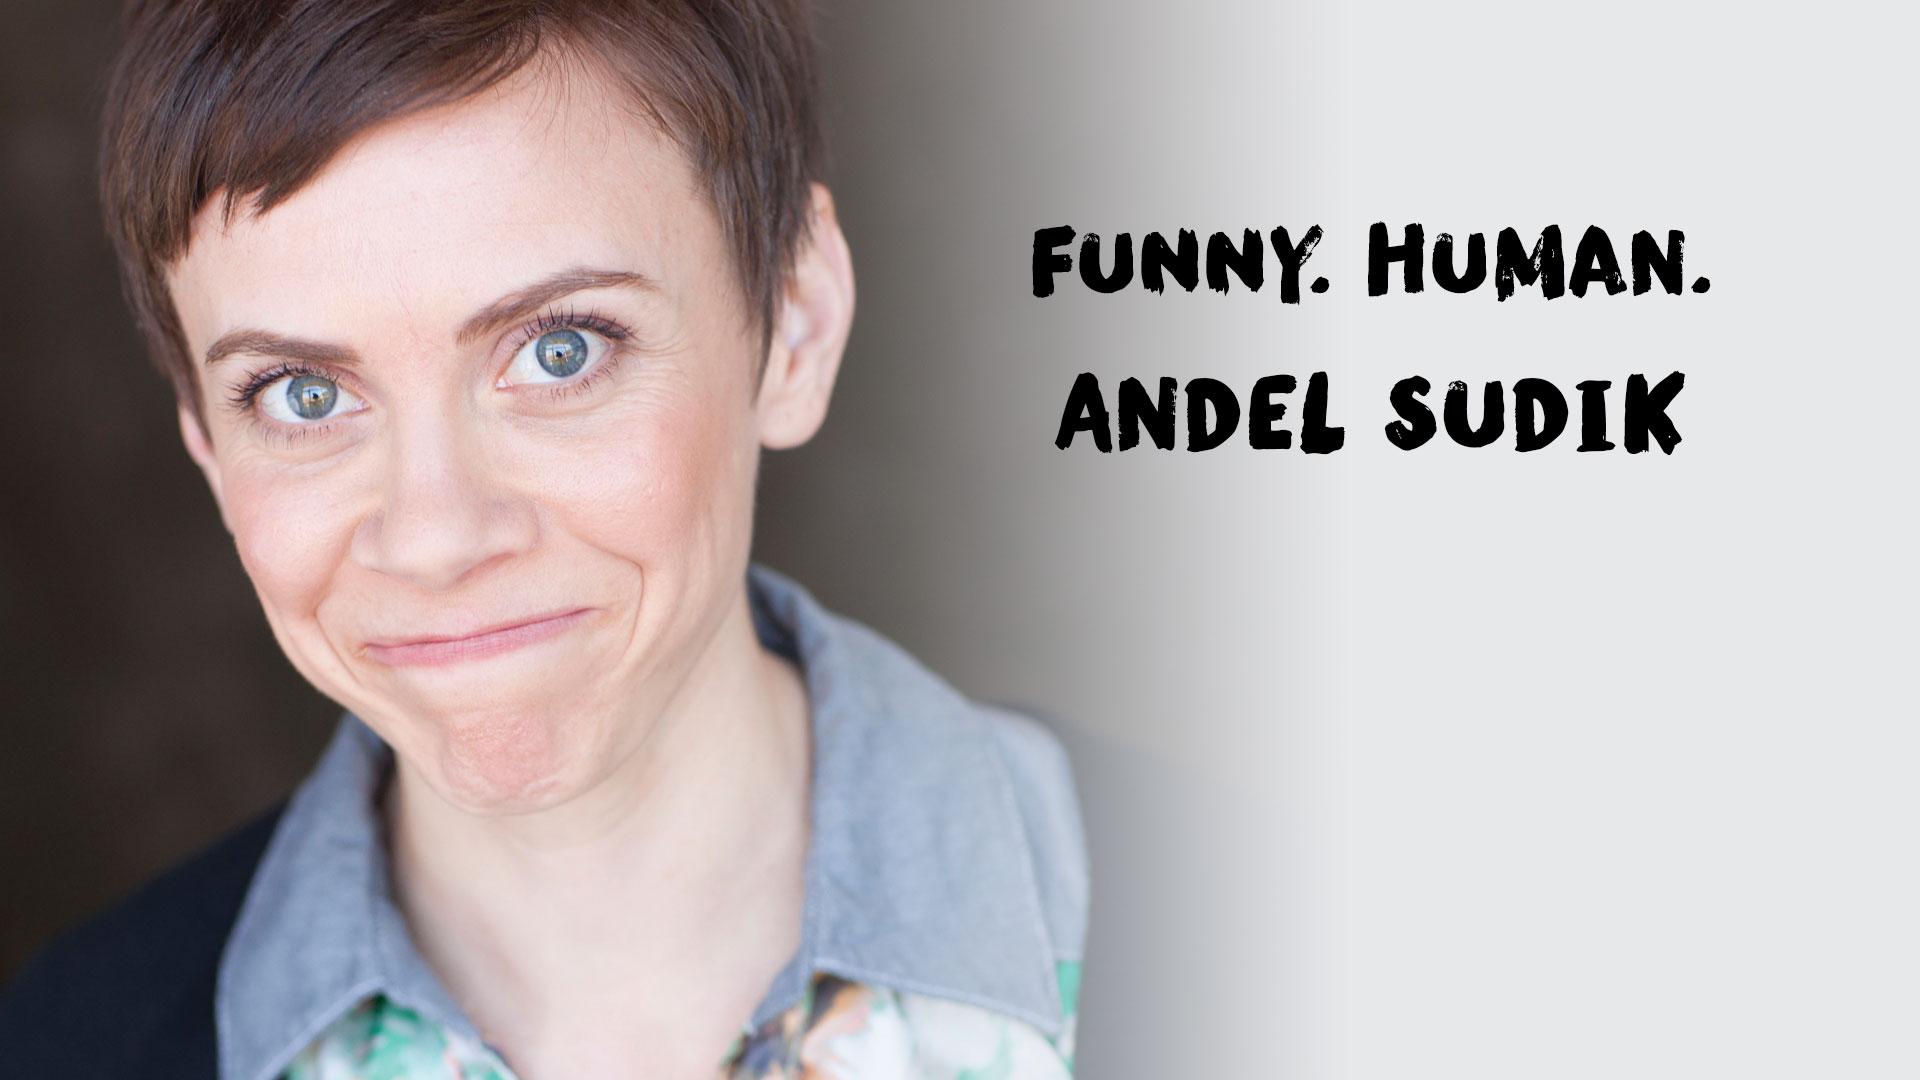 Funny Human: Andel Sudik